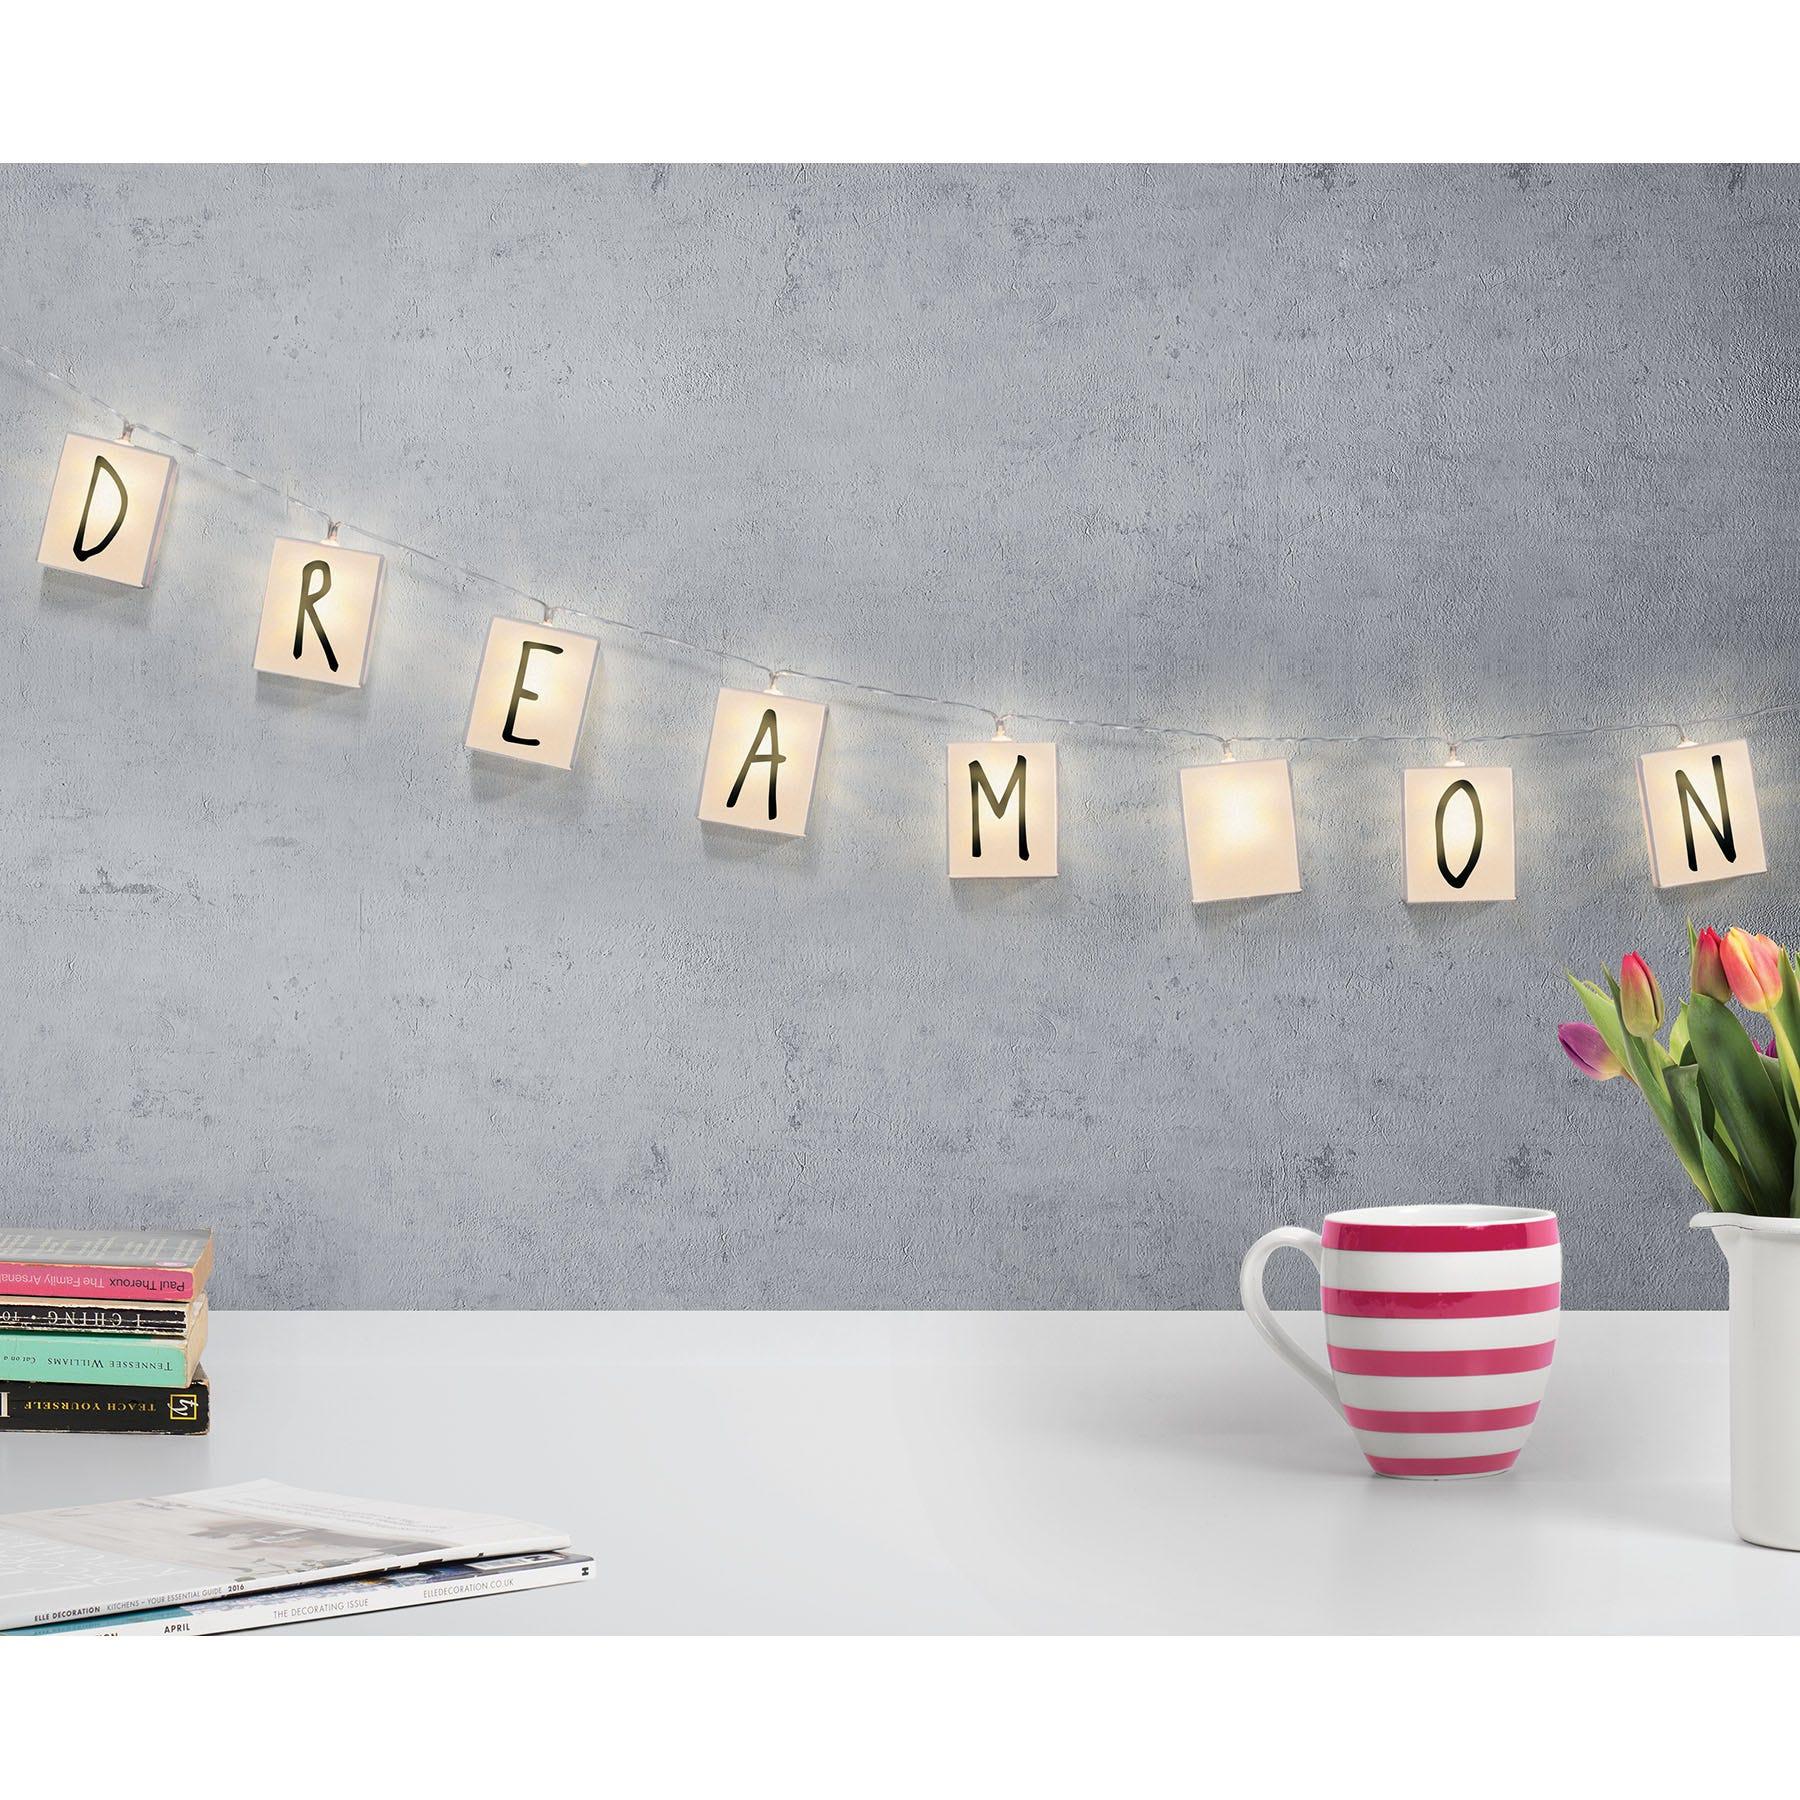 Letras con luz LED Merkury Innovations para pared